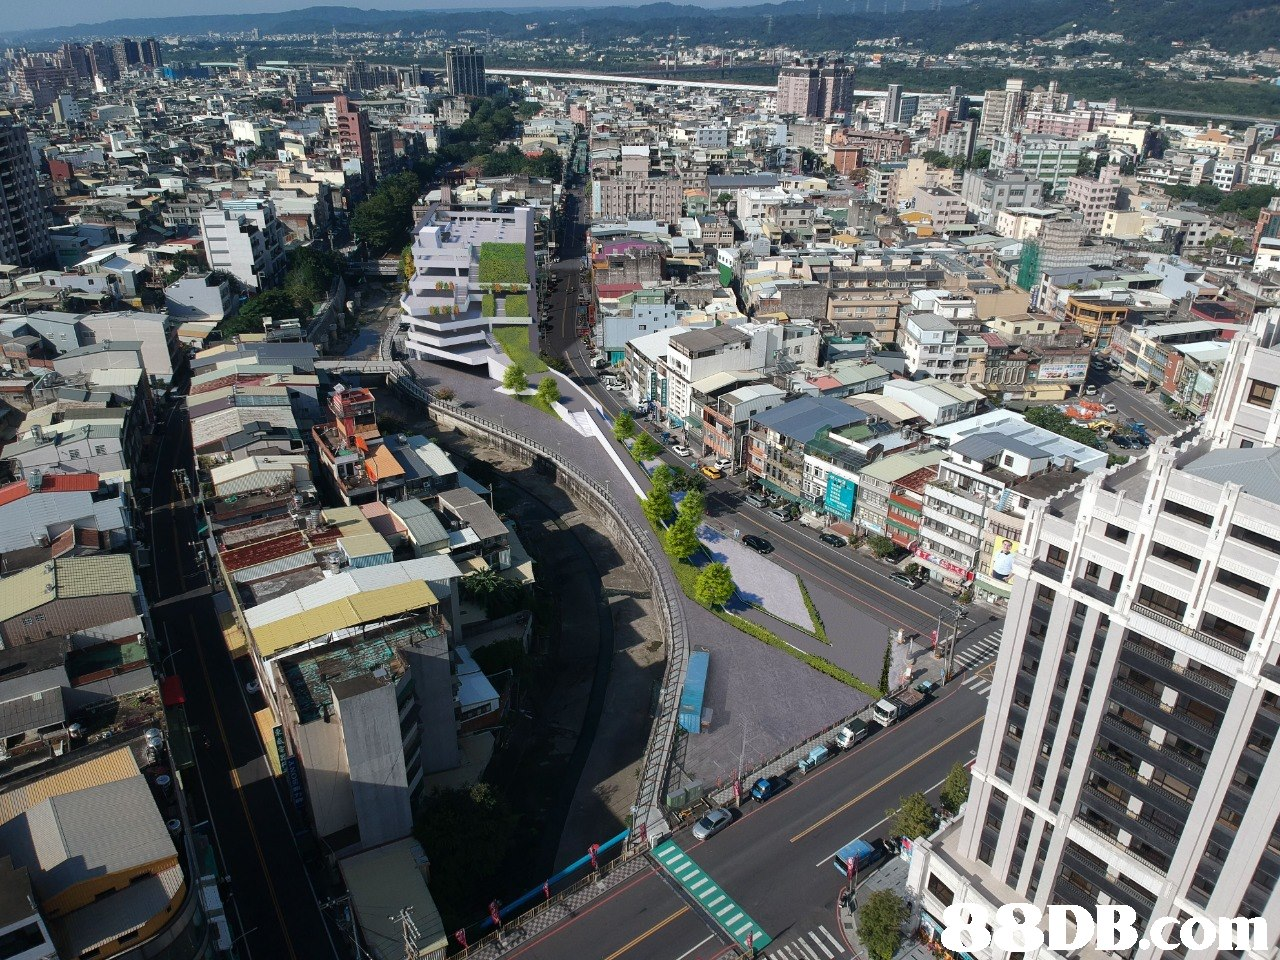 DB  urban area,city,metropolitan area,metropolis,bird's eye view